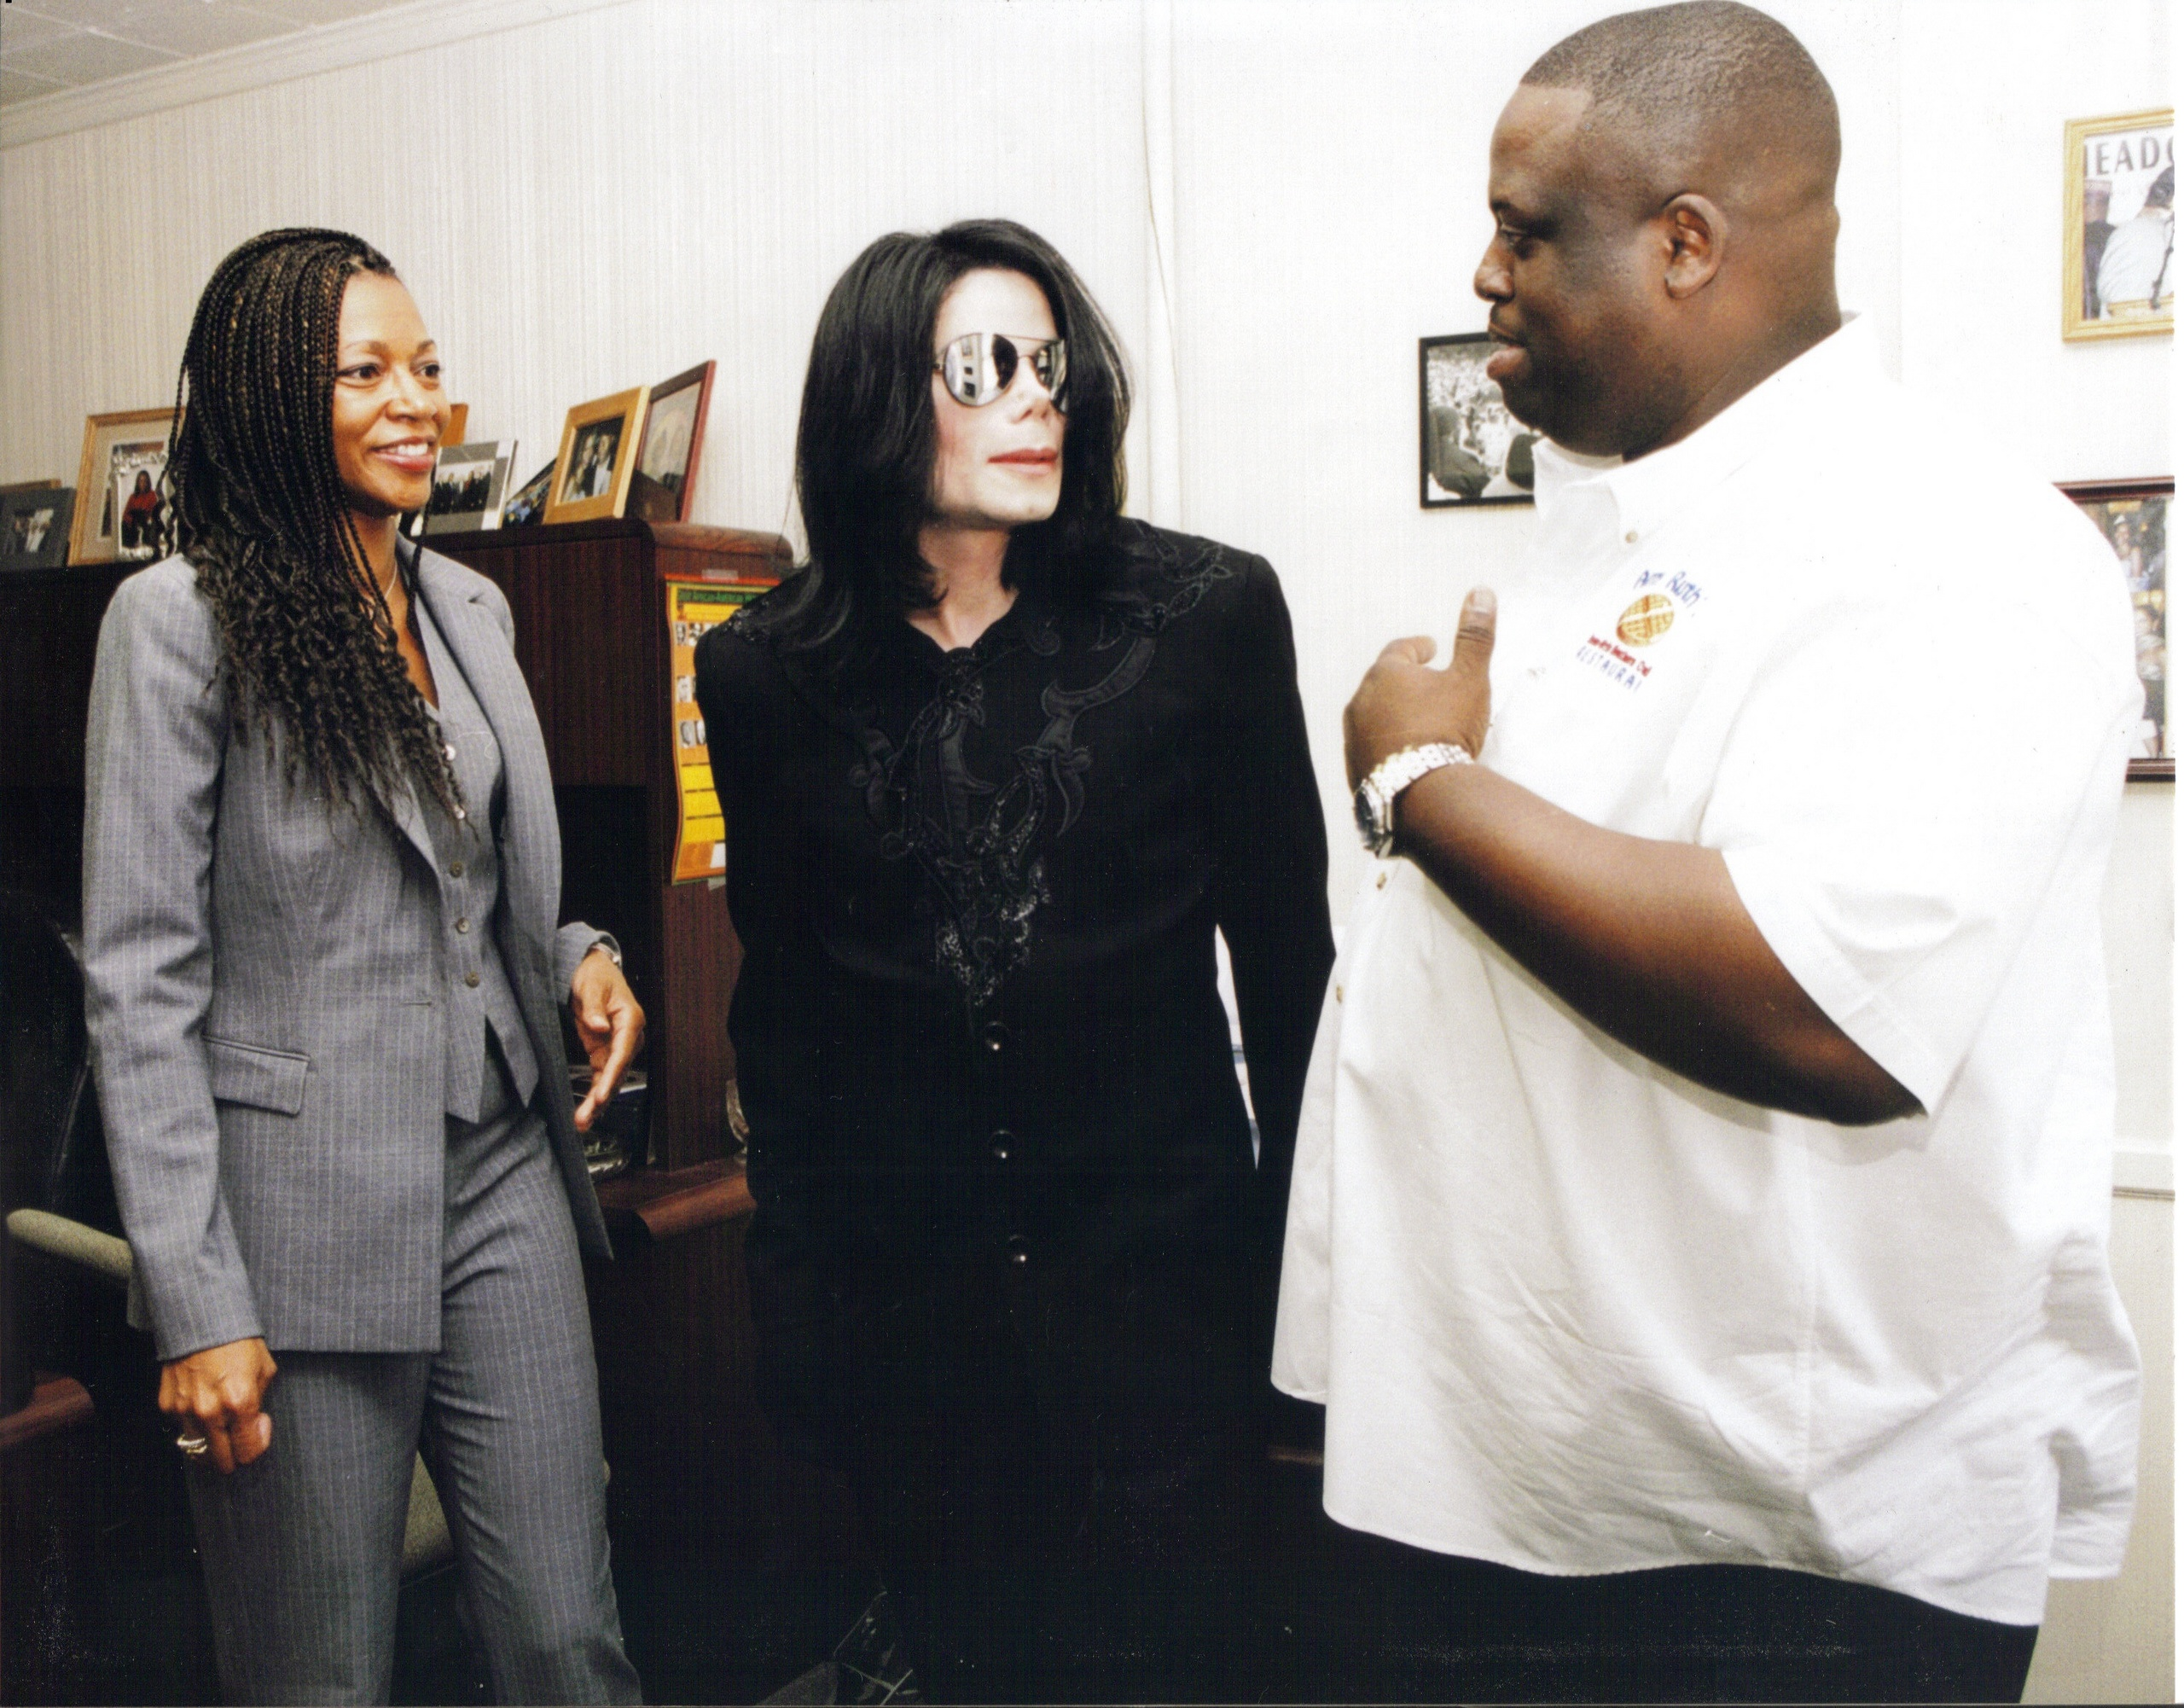 Raridades: Somente fotos RARAS de Michael Jackson. - Página 6 -michael-jackson-30629336-2560-2002